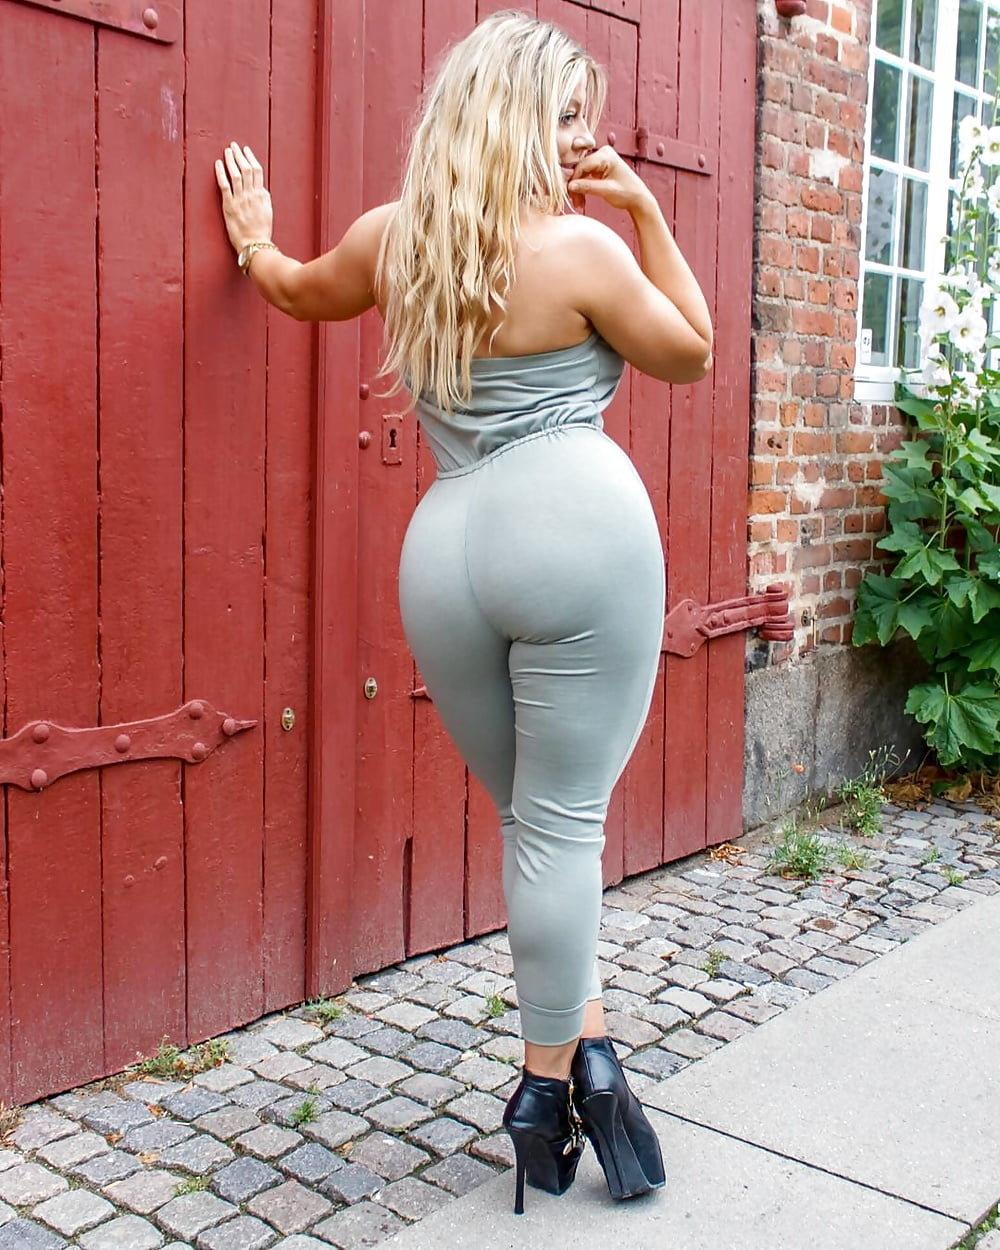 """Mia Sand Workout & diet Photos Videos Measurements Wiki ..."